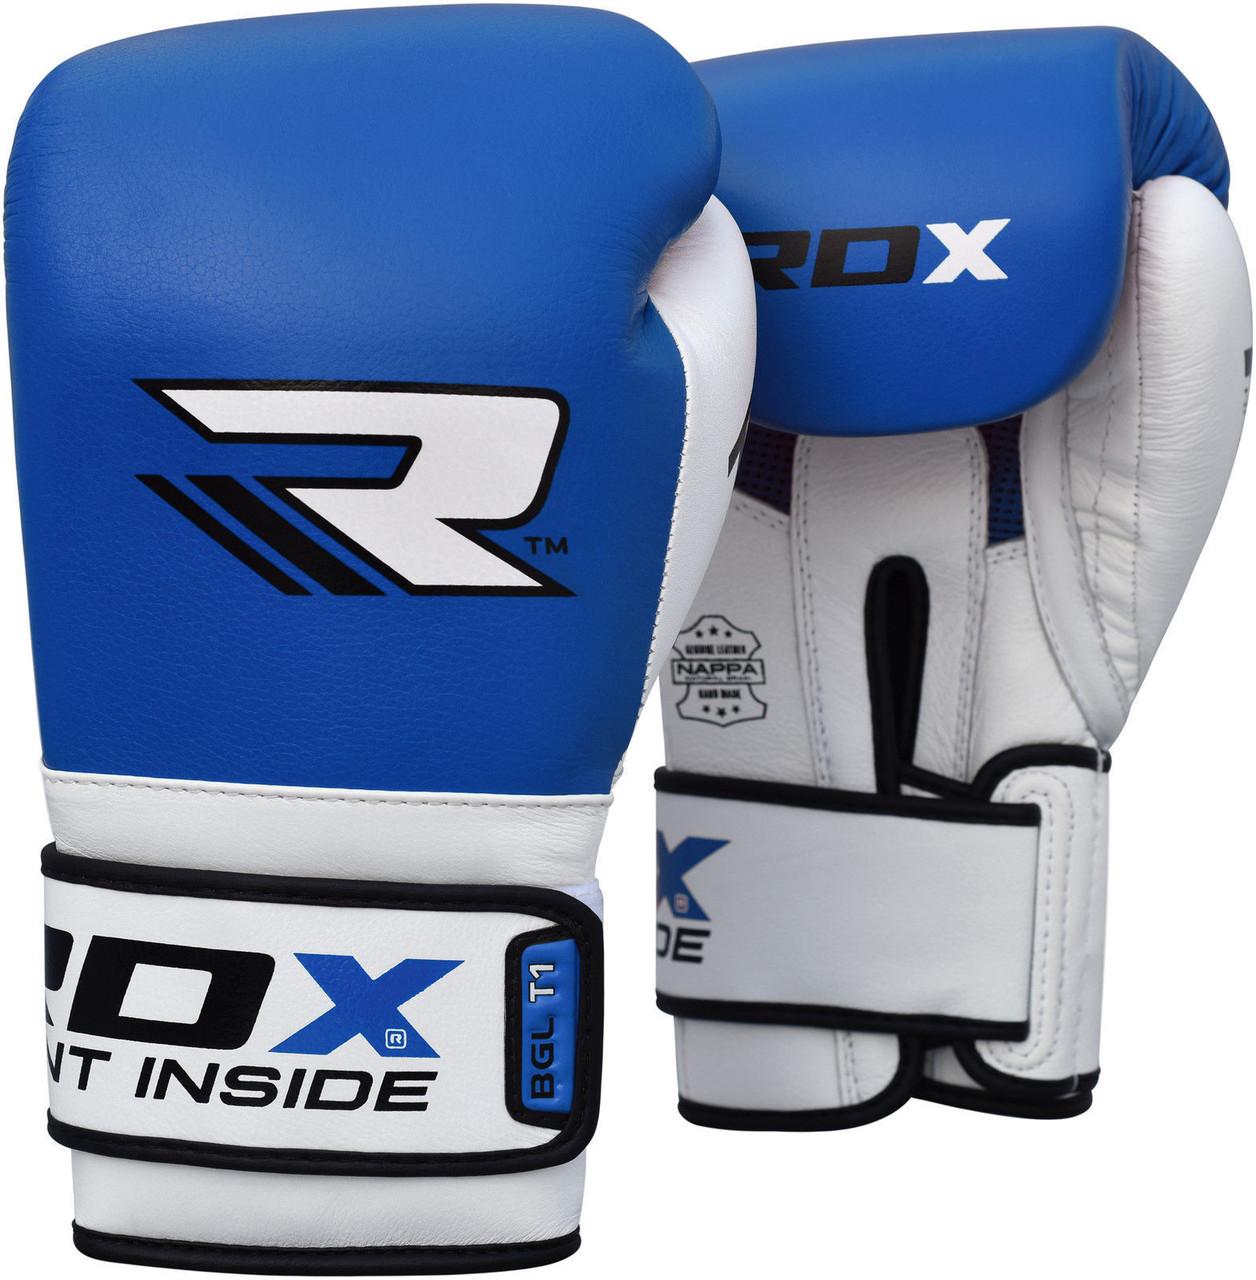 Боксерские перчатки RDX Boxing Glove BGL-T1 Gel Pro U 14 oz